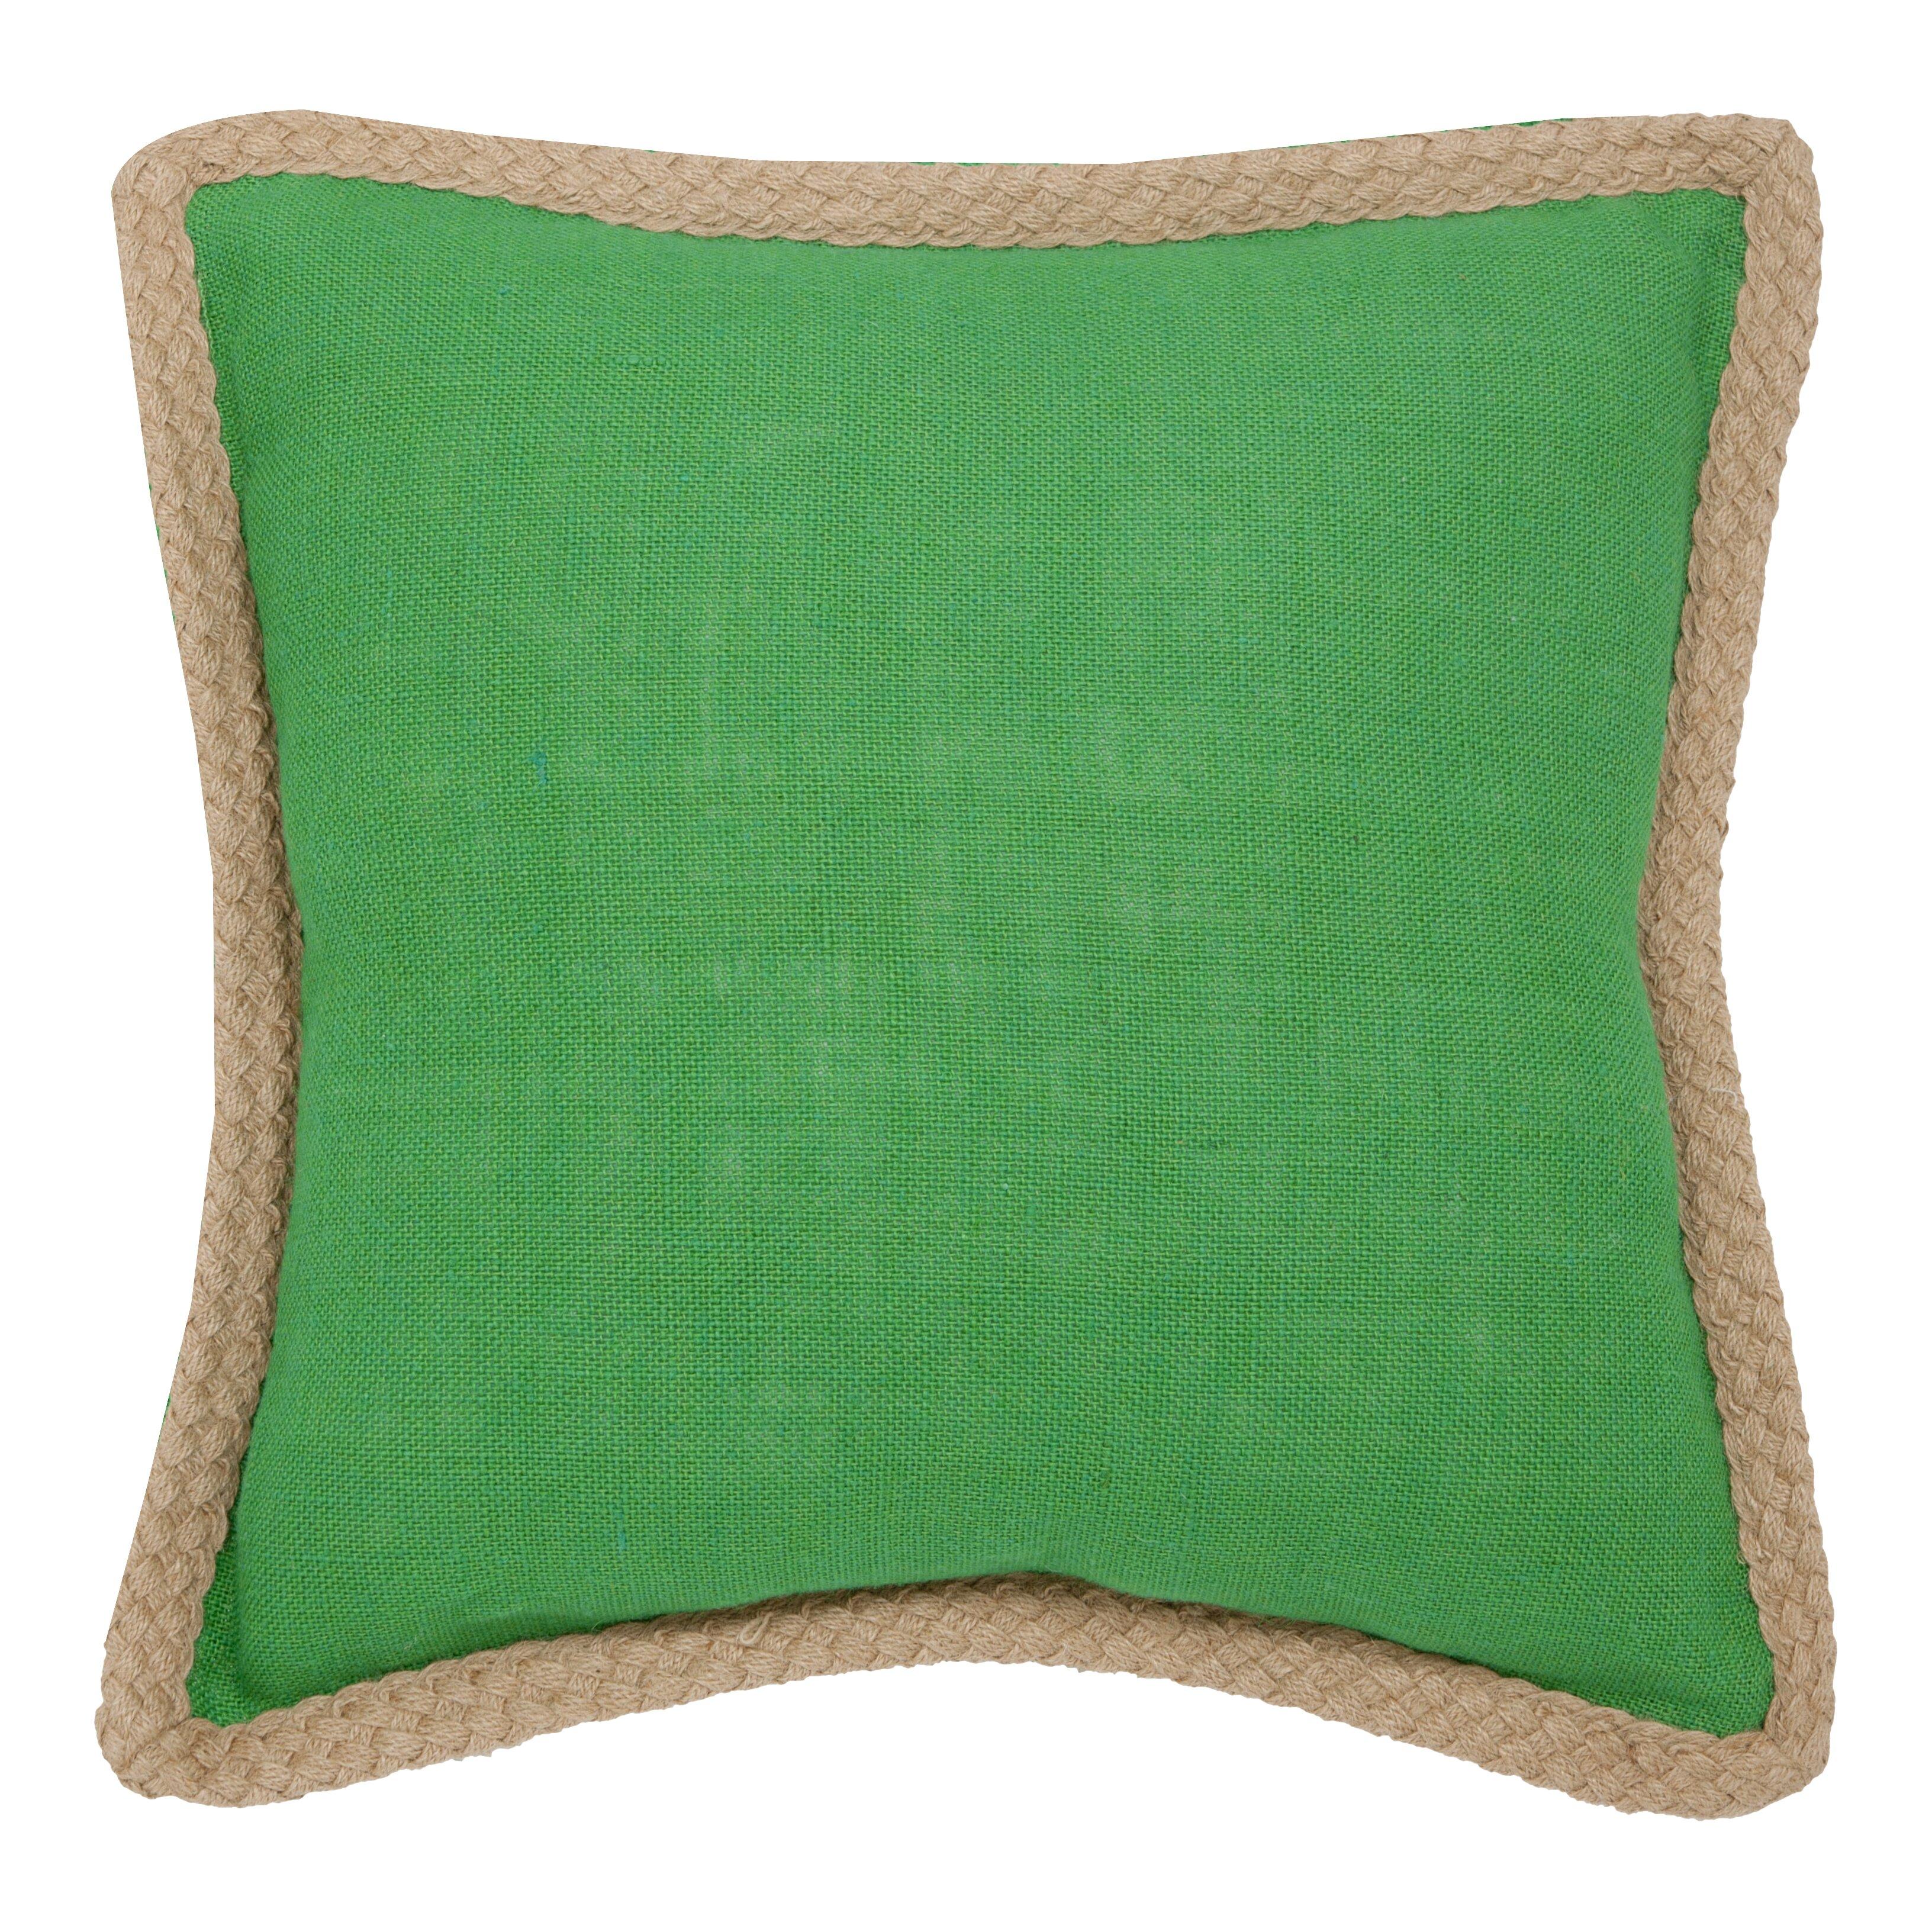 Jute Decorative Pillows : Beachcrest Home Yorkton Jute Fiber Cotton Throw Pillow & Reviews Wayfair